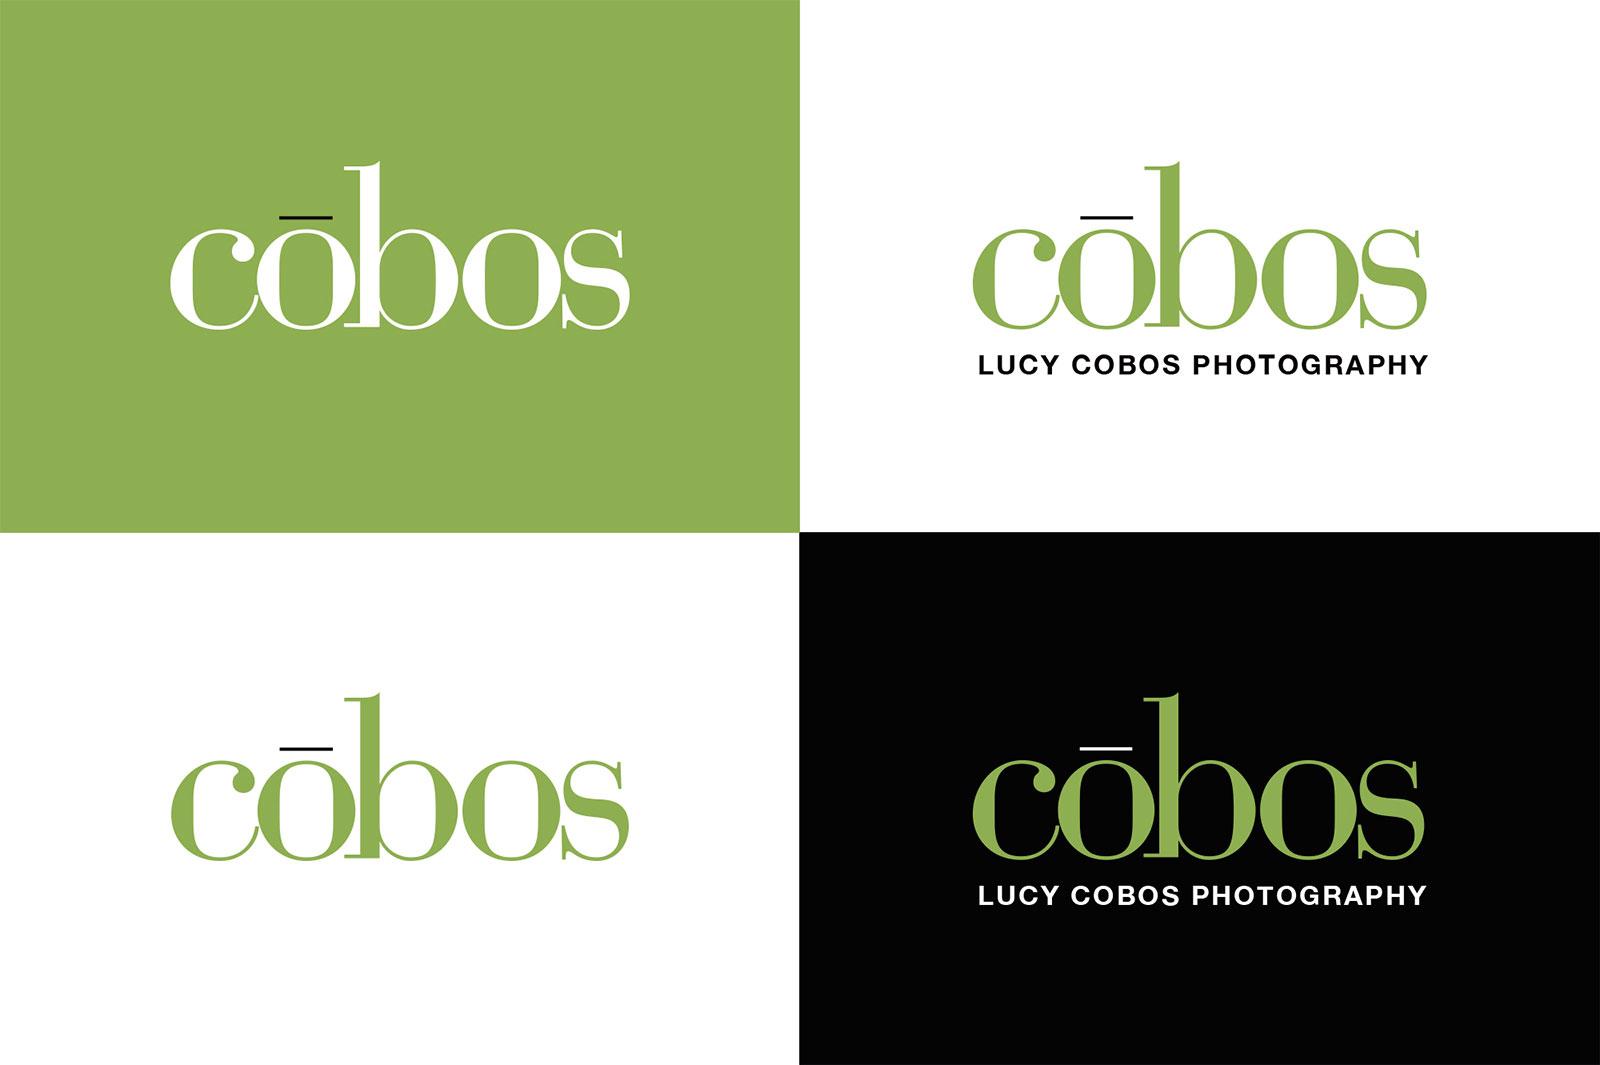 coboslogos